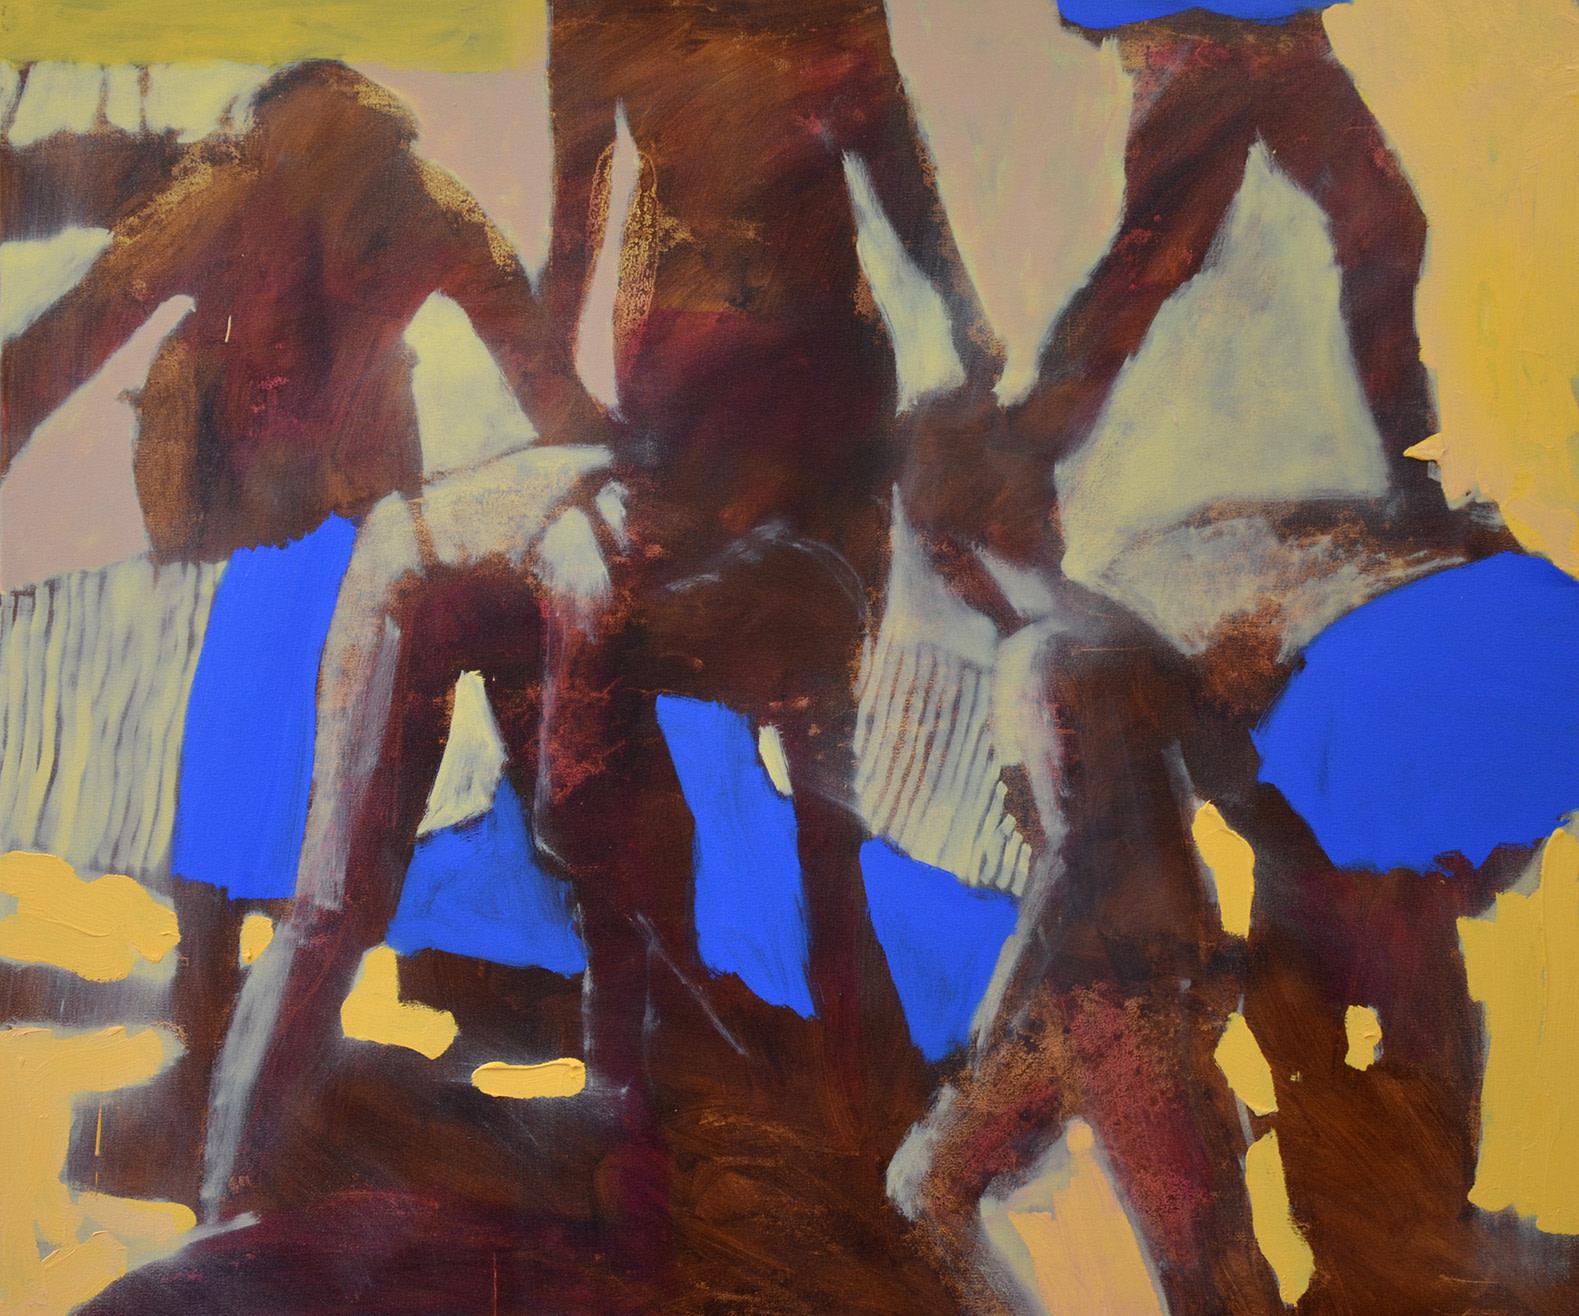 "<span class=""link fancybox-details-link""><a href=""/artists/42-nick-bodimeade/works/7181-nick-bodimeade-blue-shorts-2020/"">View Detail Page</a></span><div class=""artist""><strong>Nick Bodimeade</strong></div> b. 1957 <div class=""title""><em>Blue Shorts</em>, 2020</div> <div class=""signed_and_dated"">signed, titled and dated to reverse</div> <div class=""medium"">oil on canvas</div> <div class=""dimensions"">h. 110 x w. 130 cm</div><div class=""price"">£4,800.00</div><div class=""copyright_line"">Own Art: £ 250 x 10 Months, 0% APR + £ 2,300 deposit</div>"